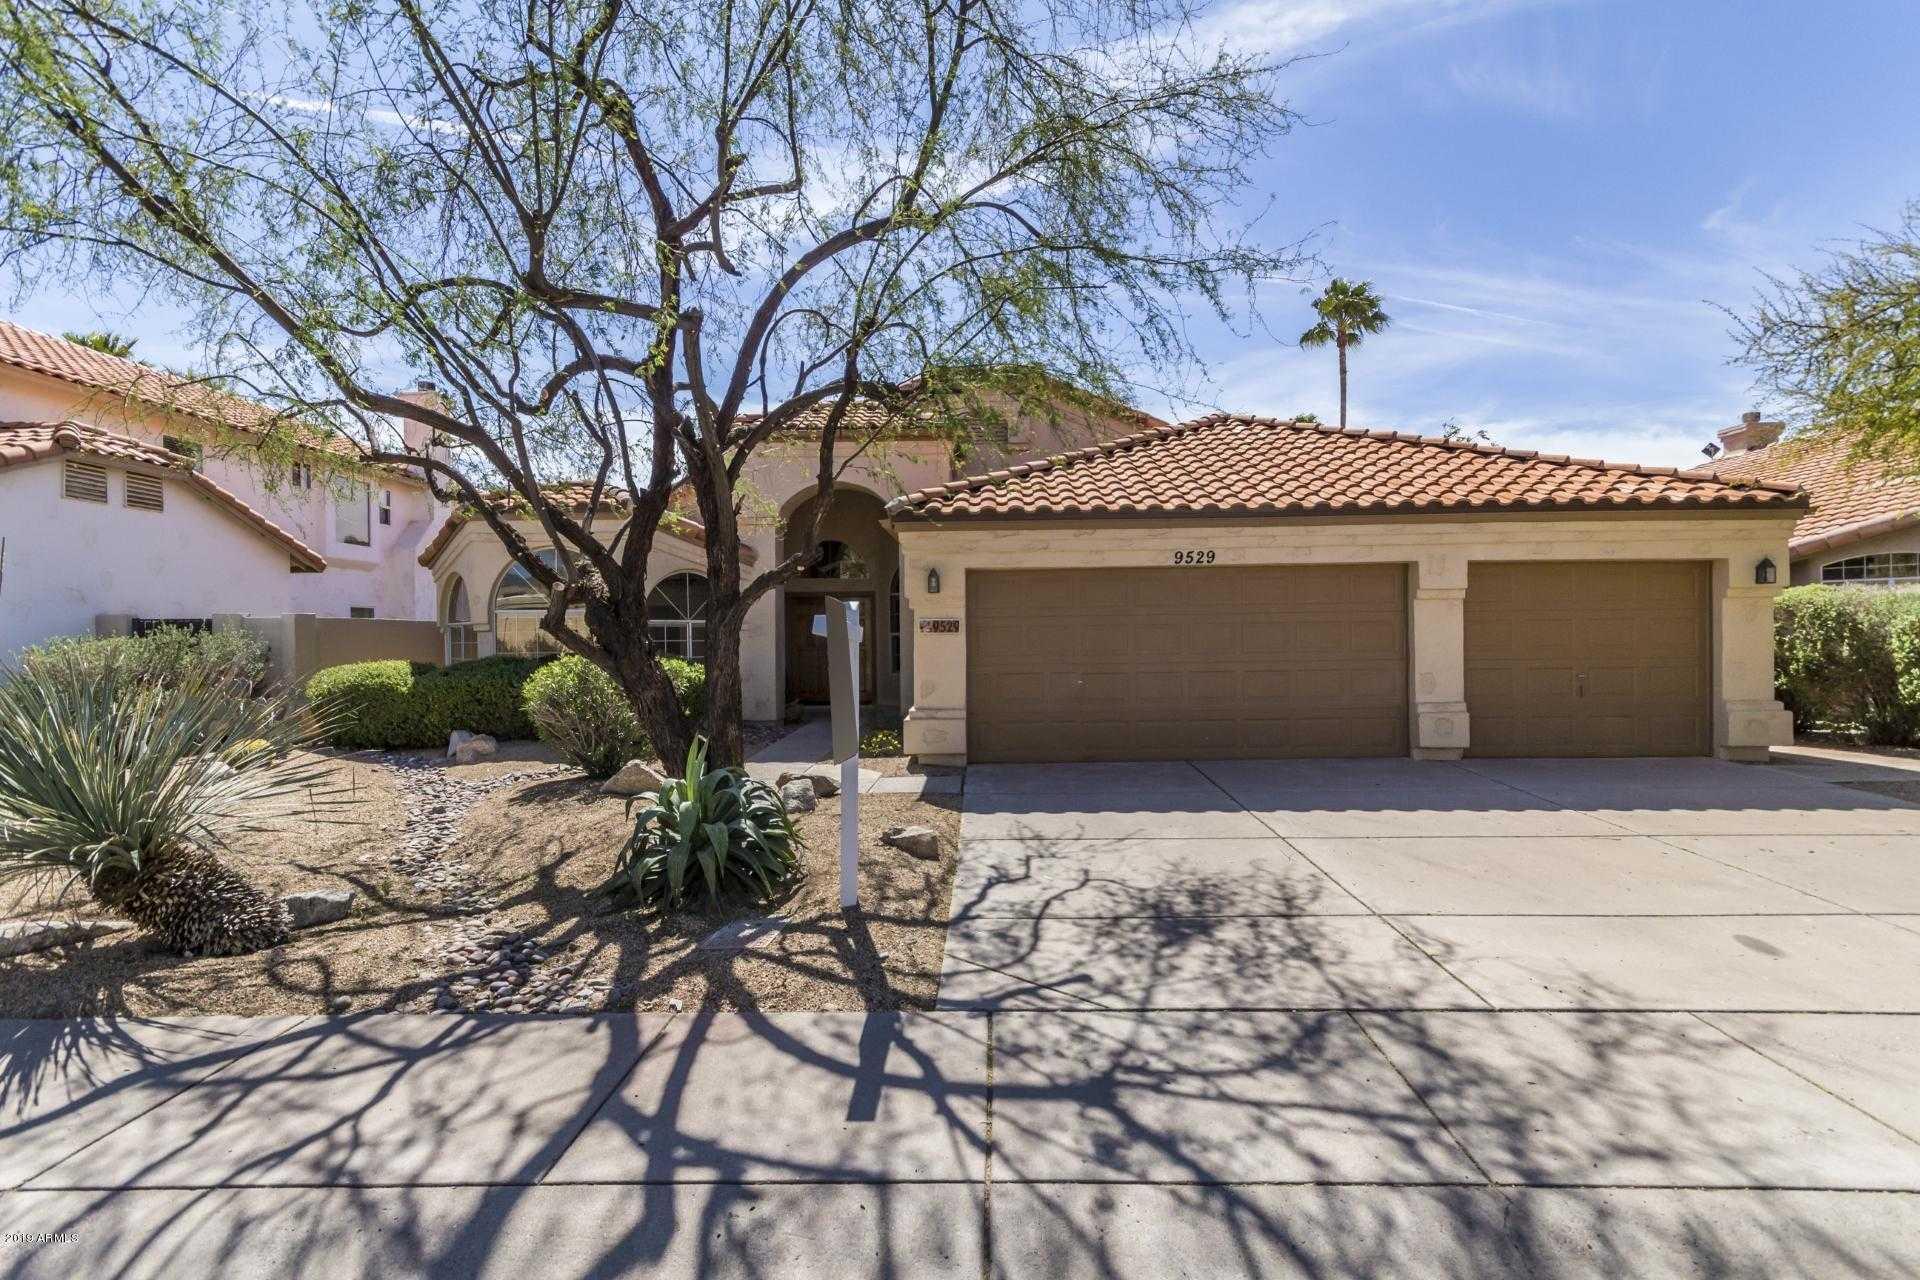 $529,000 - 3Br/2Ba - Home for Sale in Casa Privada Amd Lot 1-70 Tr A-f, Scottsdale